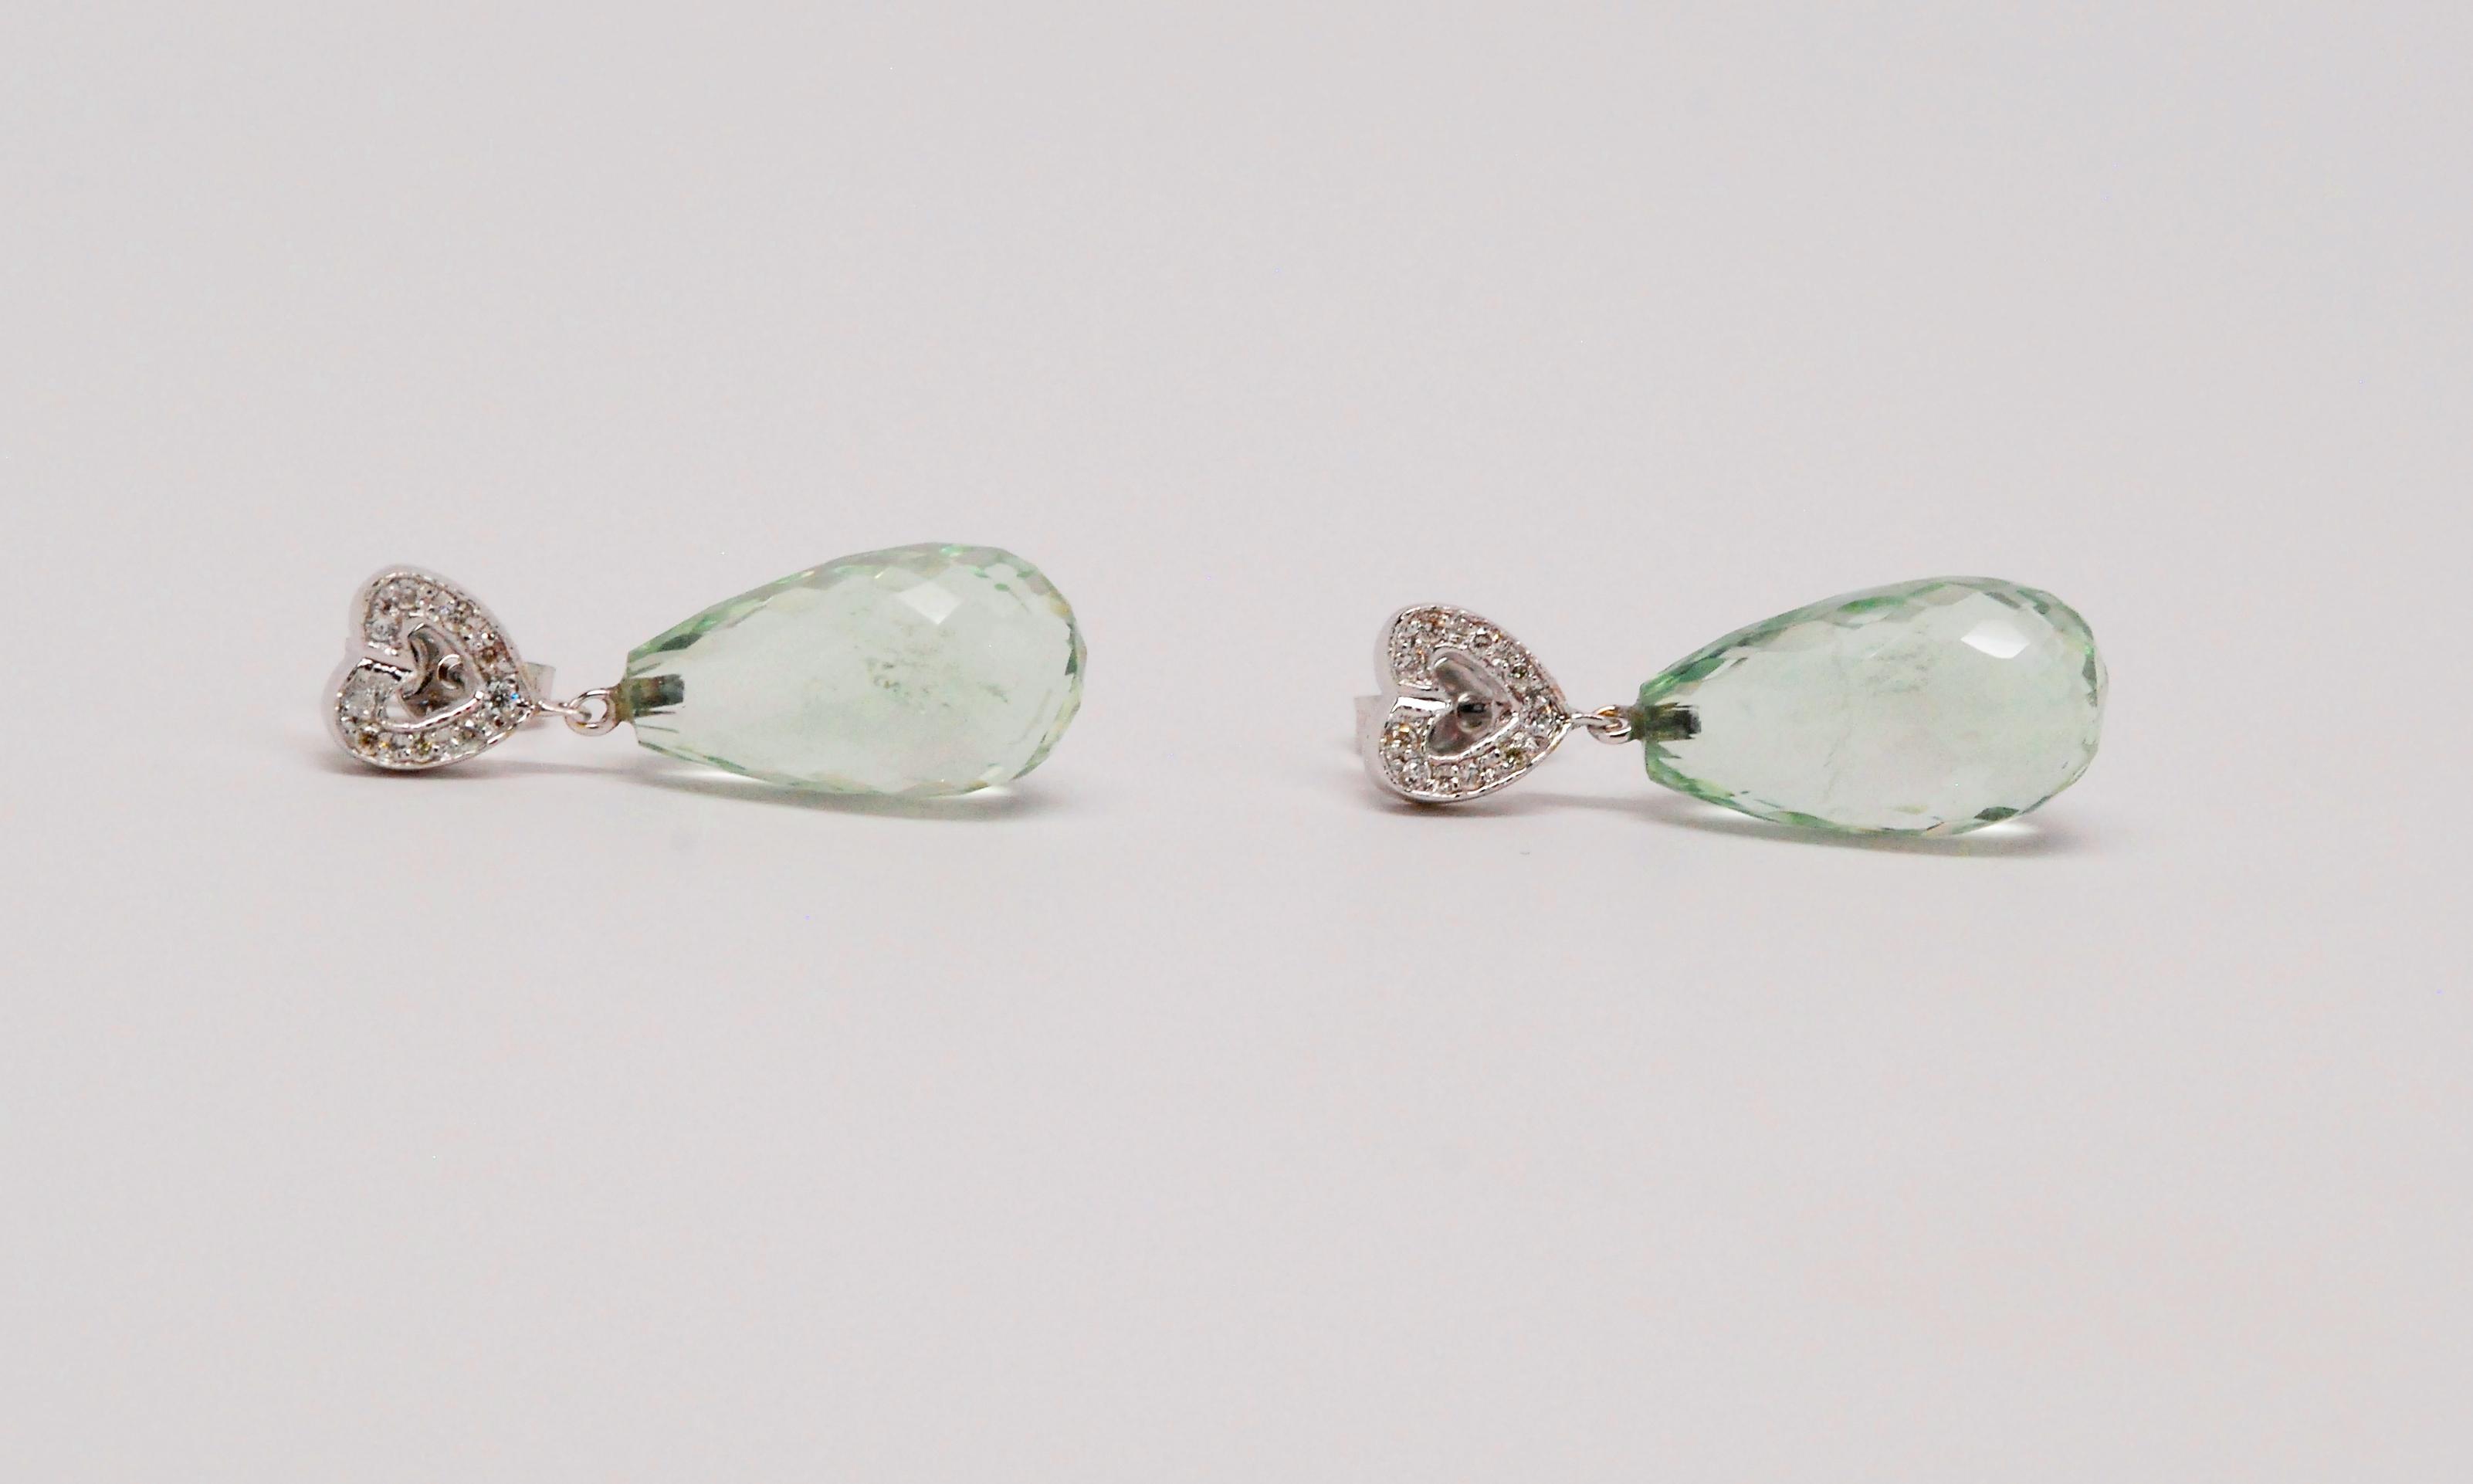 18k White Gold Mint Green Amethyst & Round Diamond Earrings